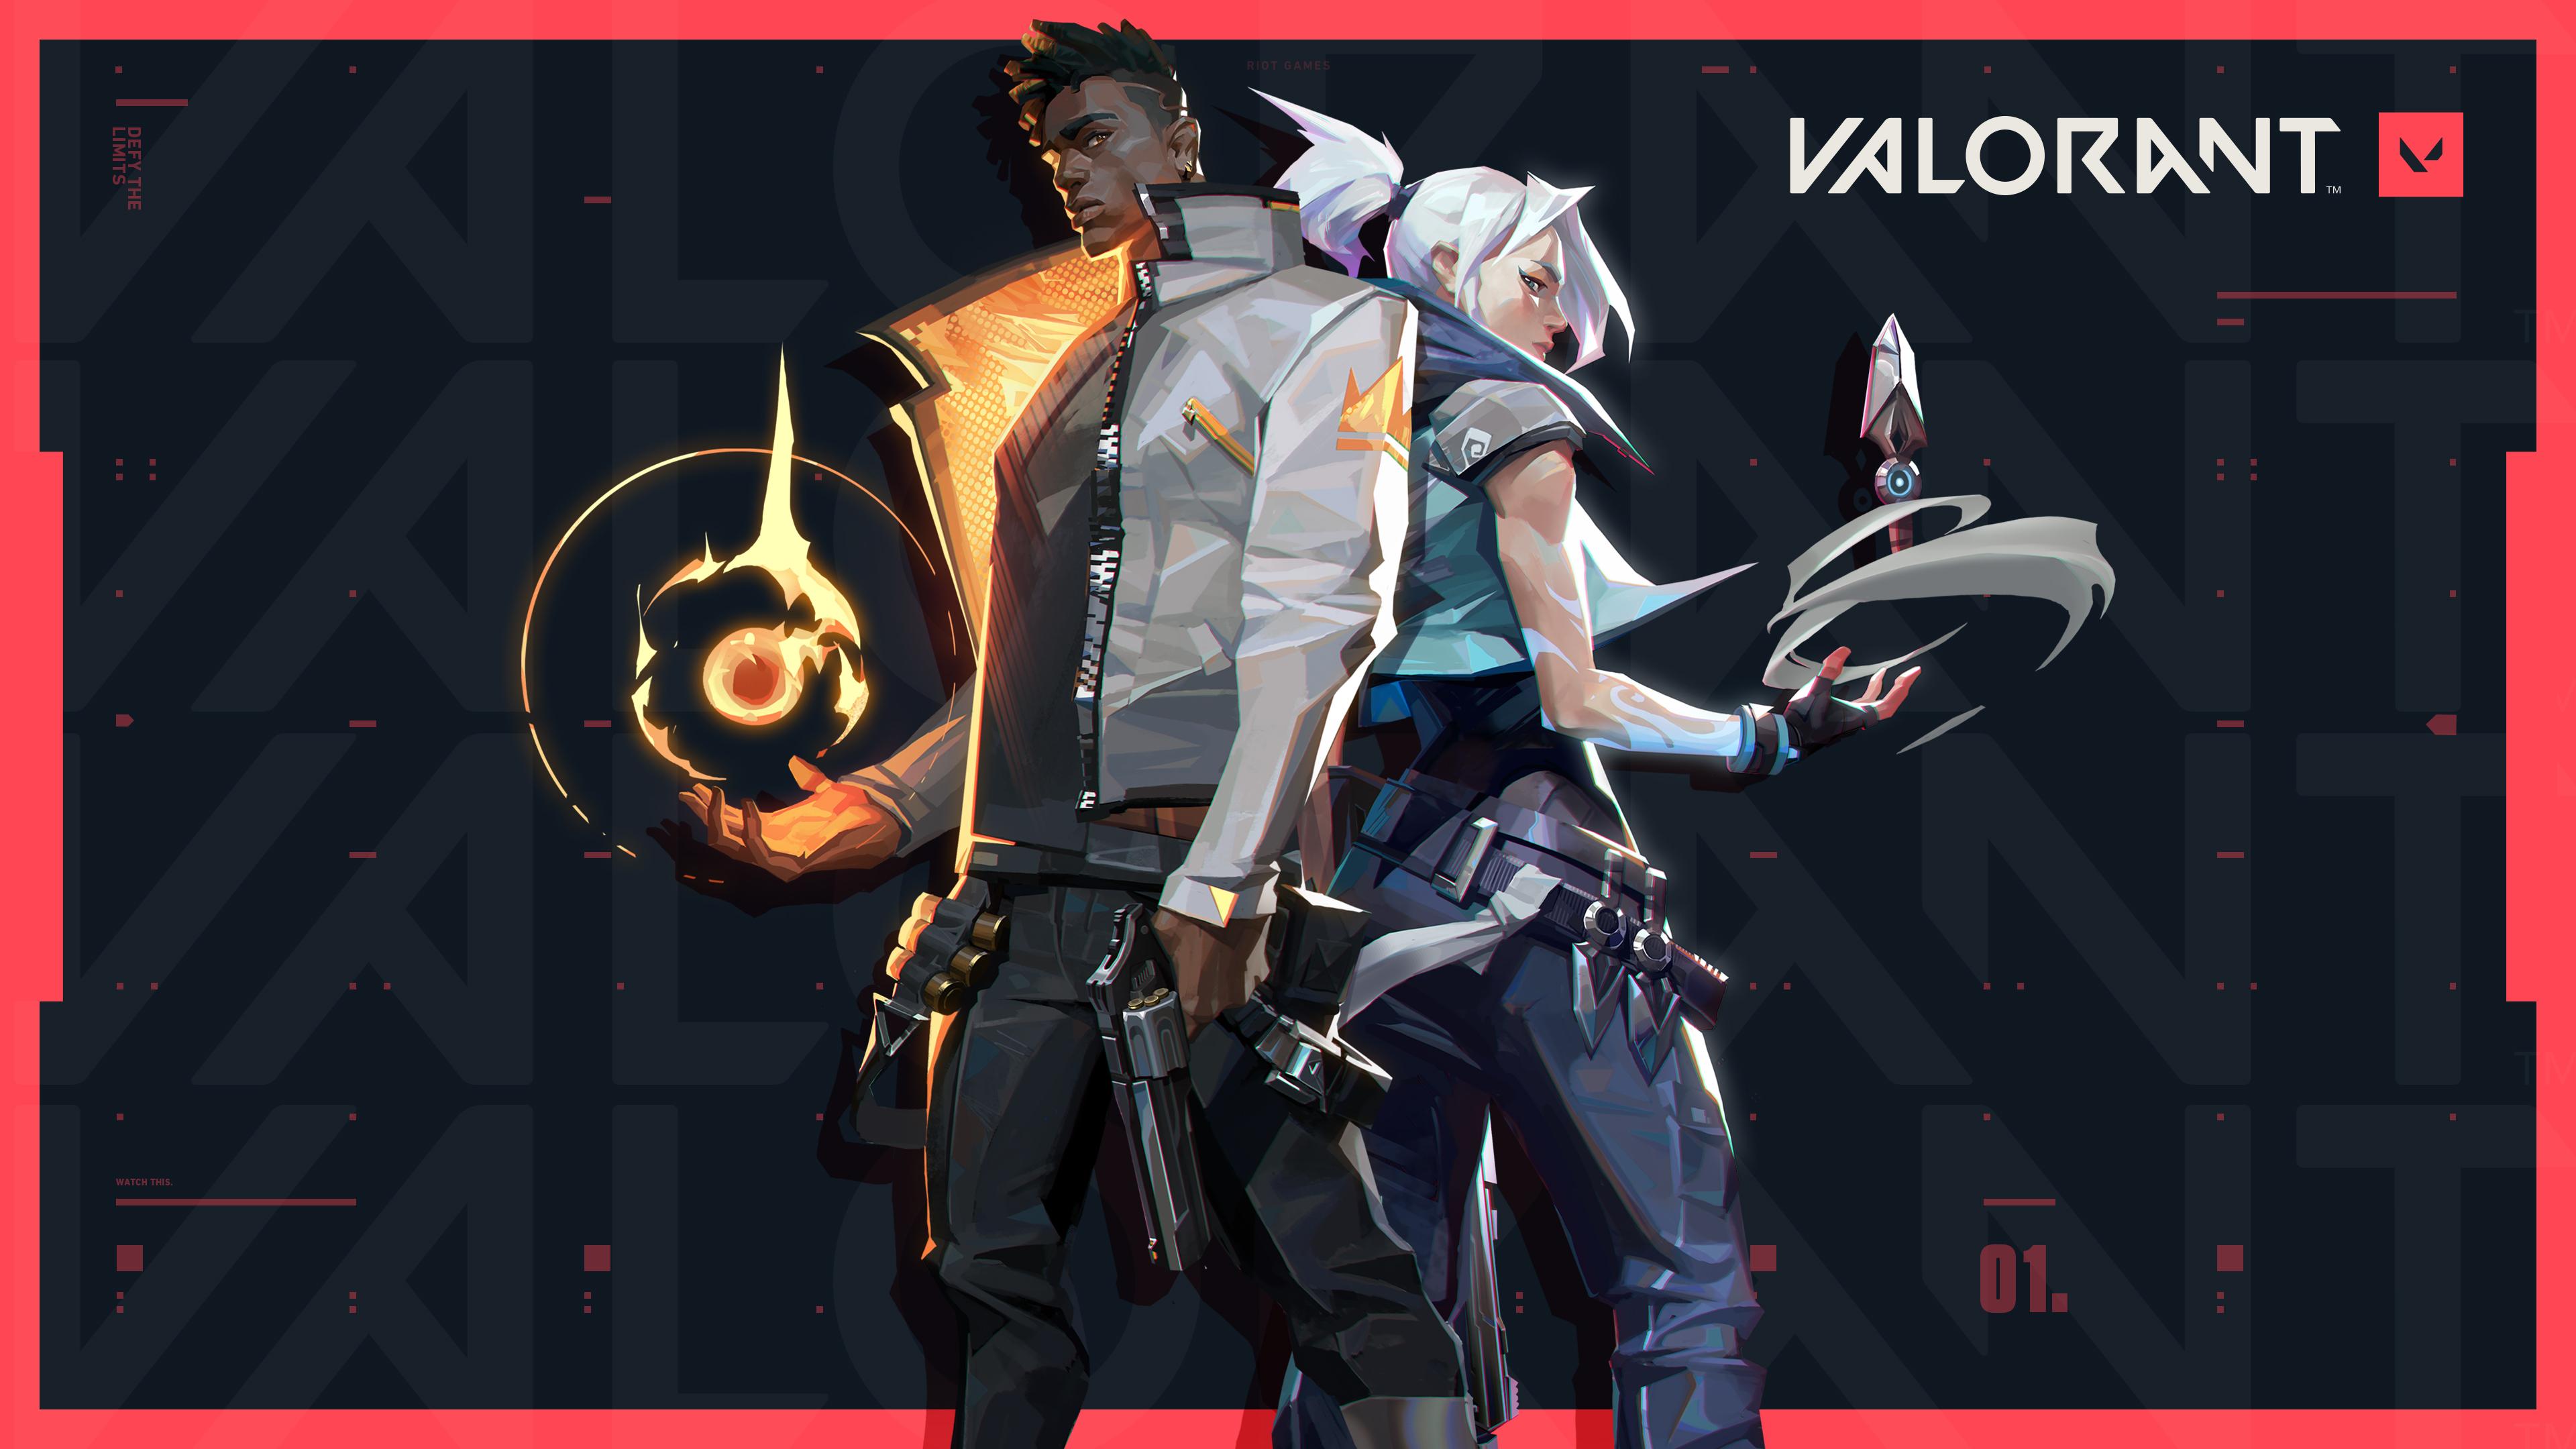 Valorant Game 4K Wallpaper, HD Games 4K Wallpapers, Images ...